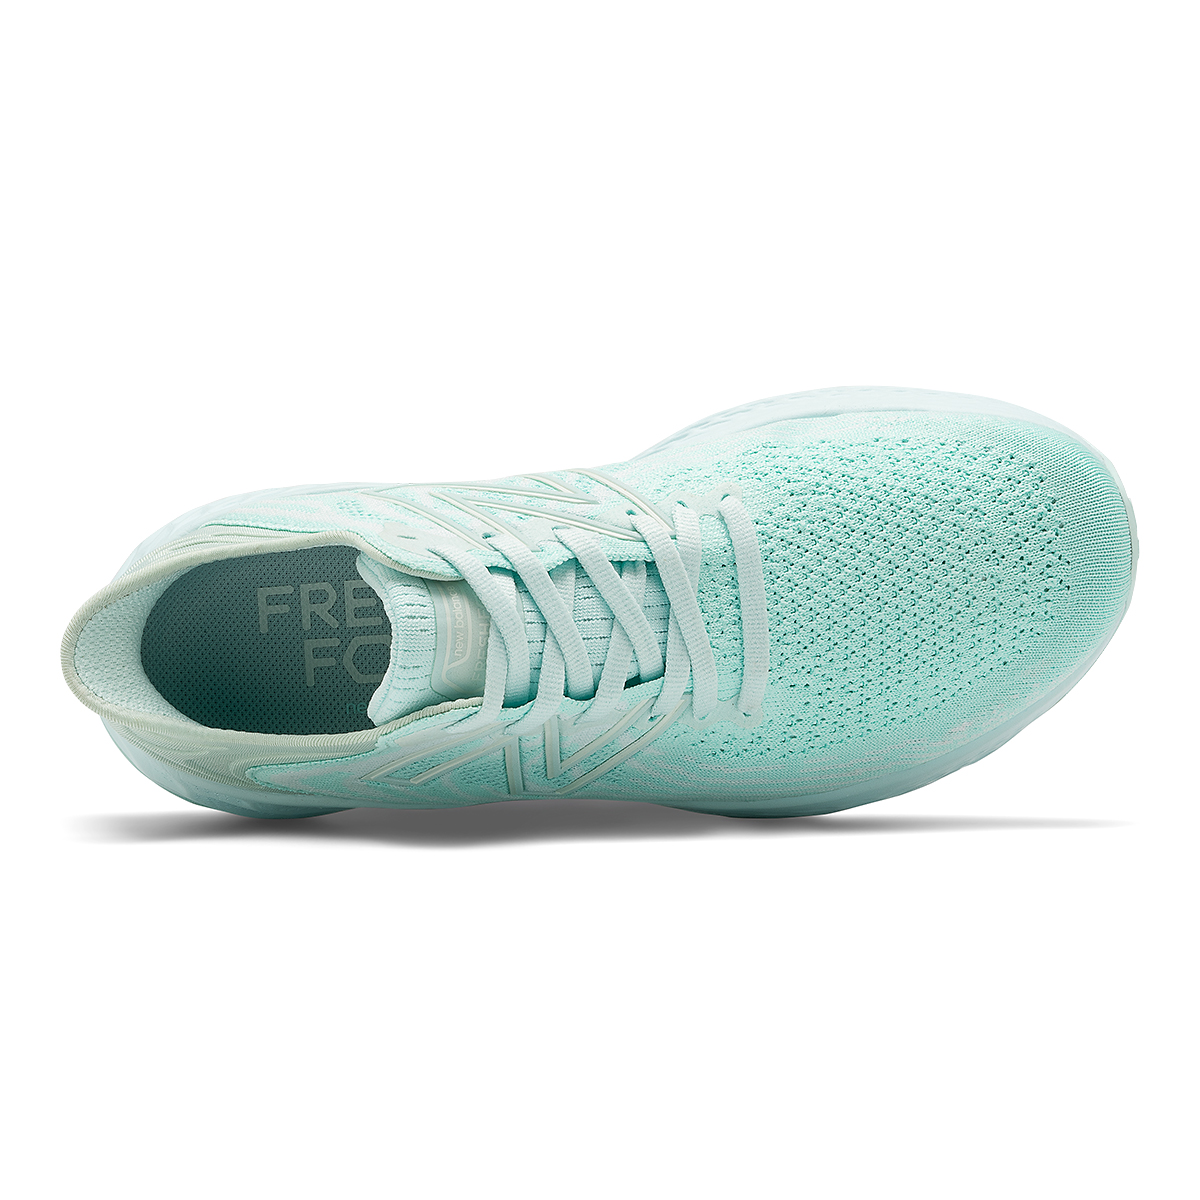 Women's New Balance Fresh Foam 1080V11 Running Shoe - Color: White Mint/White Jade - Size: 13 - Width: Regular, Mint Green, large, image 4